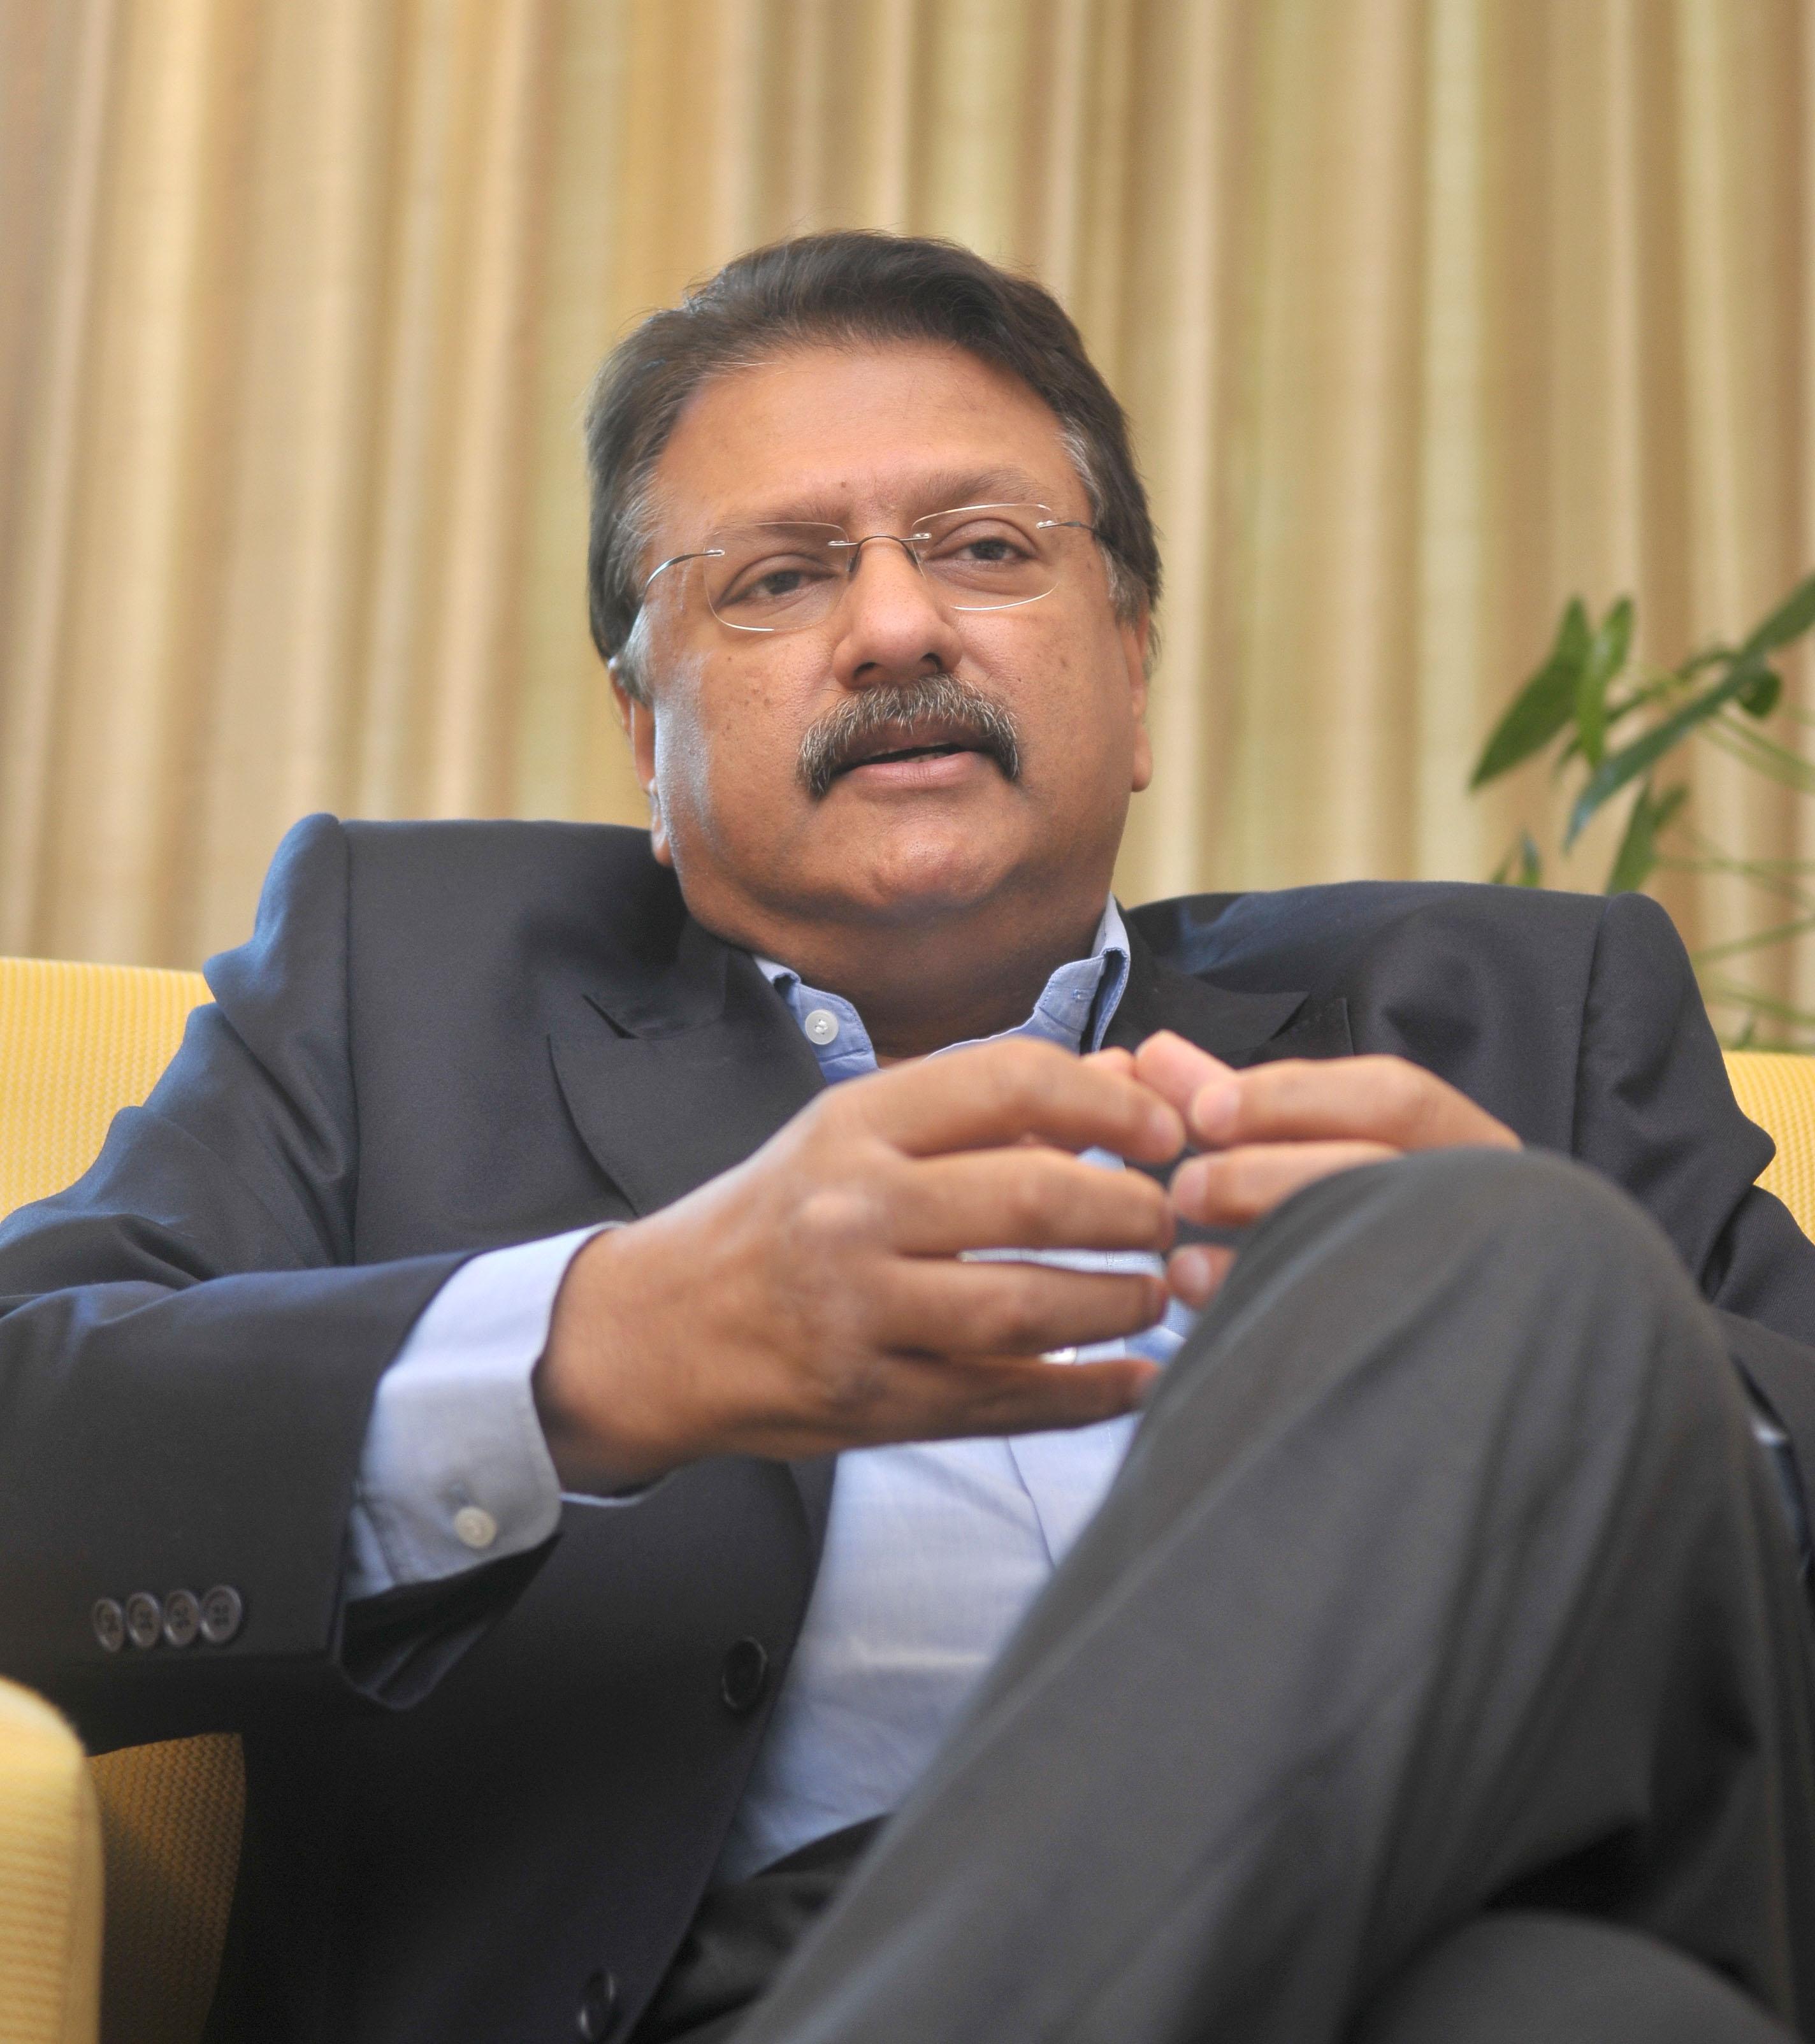 Ajay Piramal Net Worth